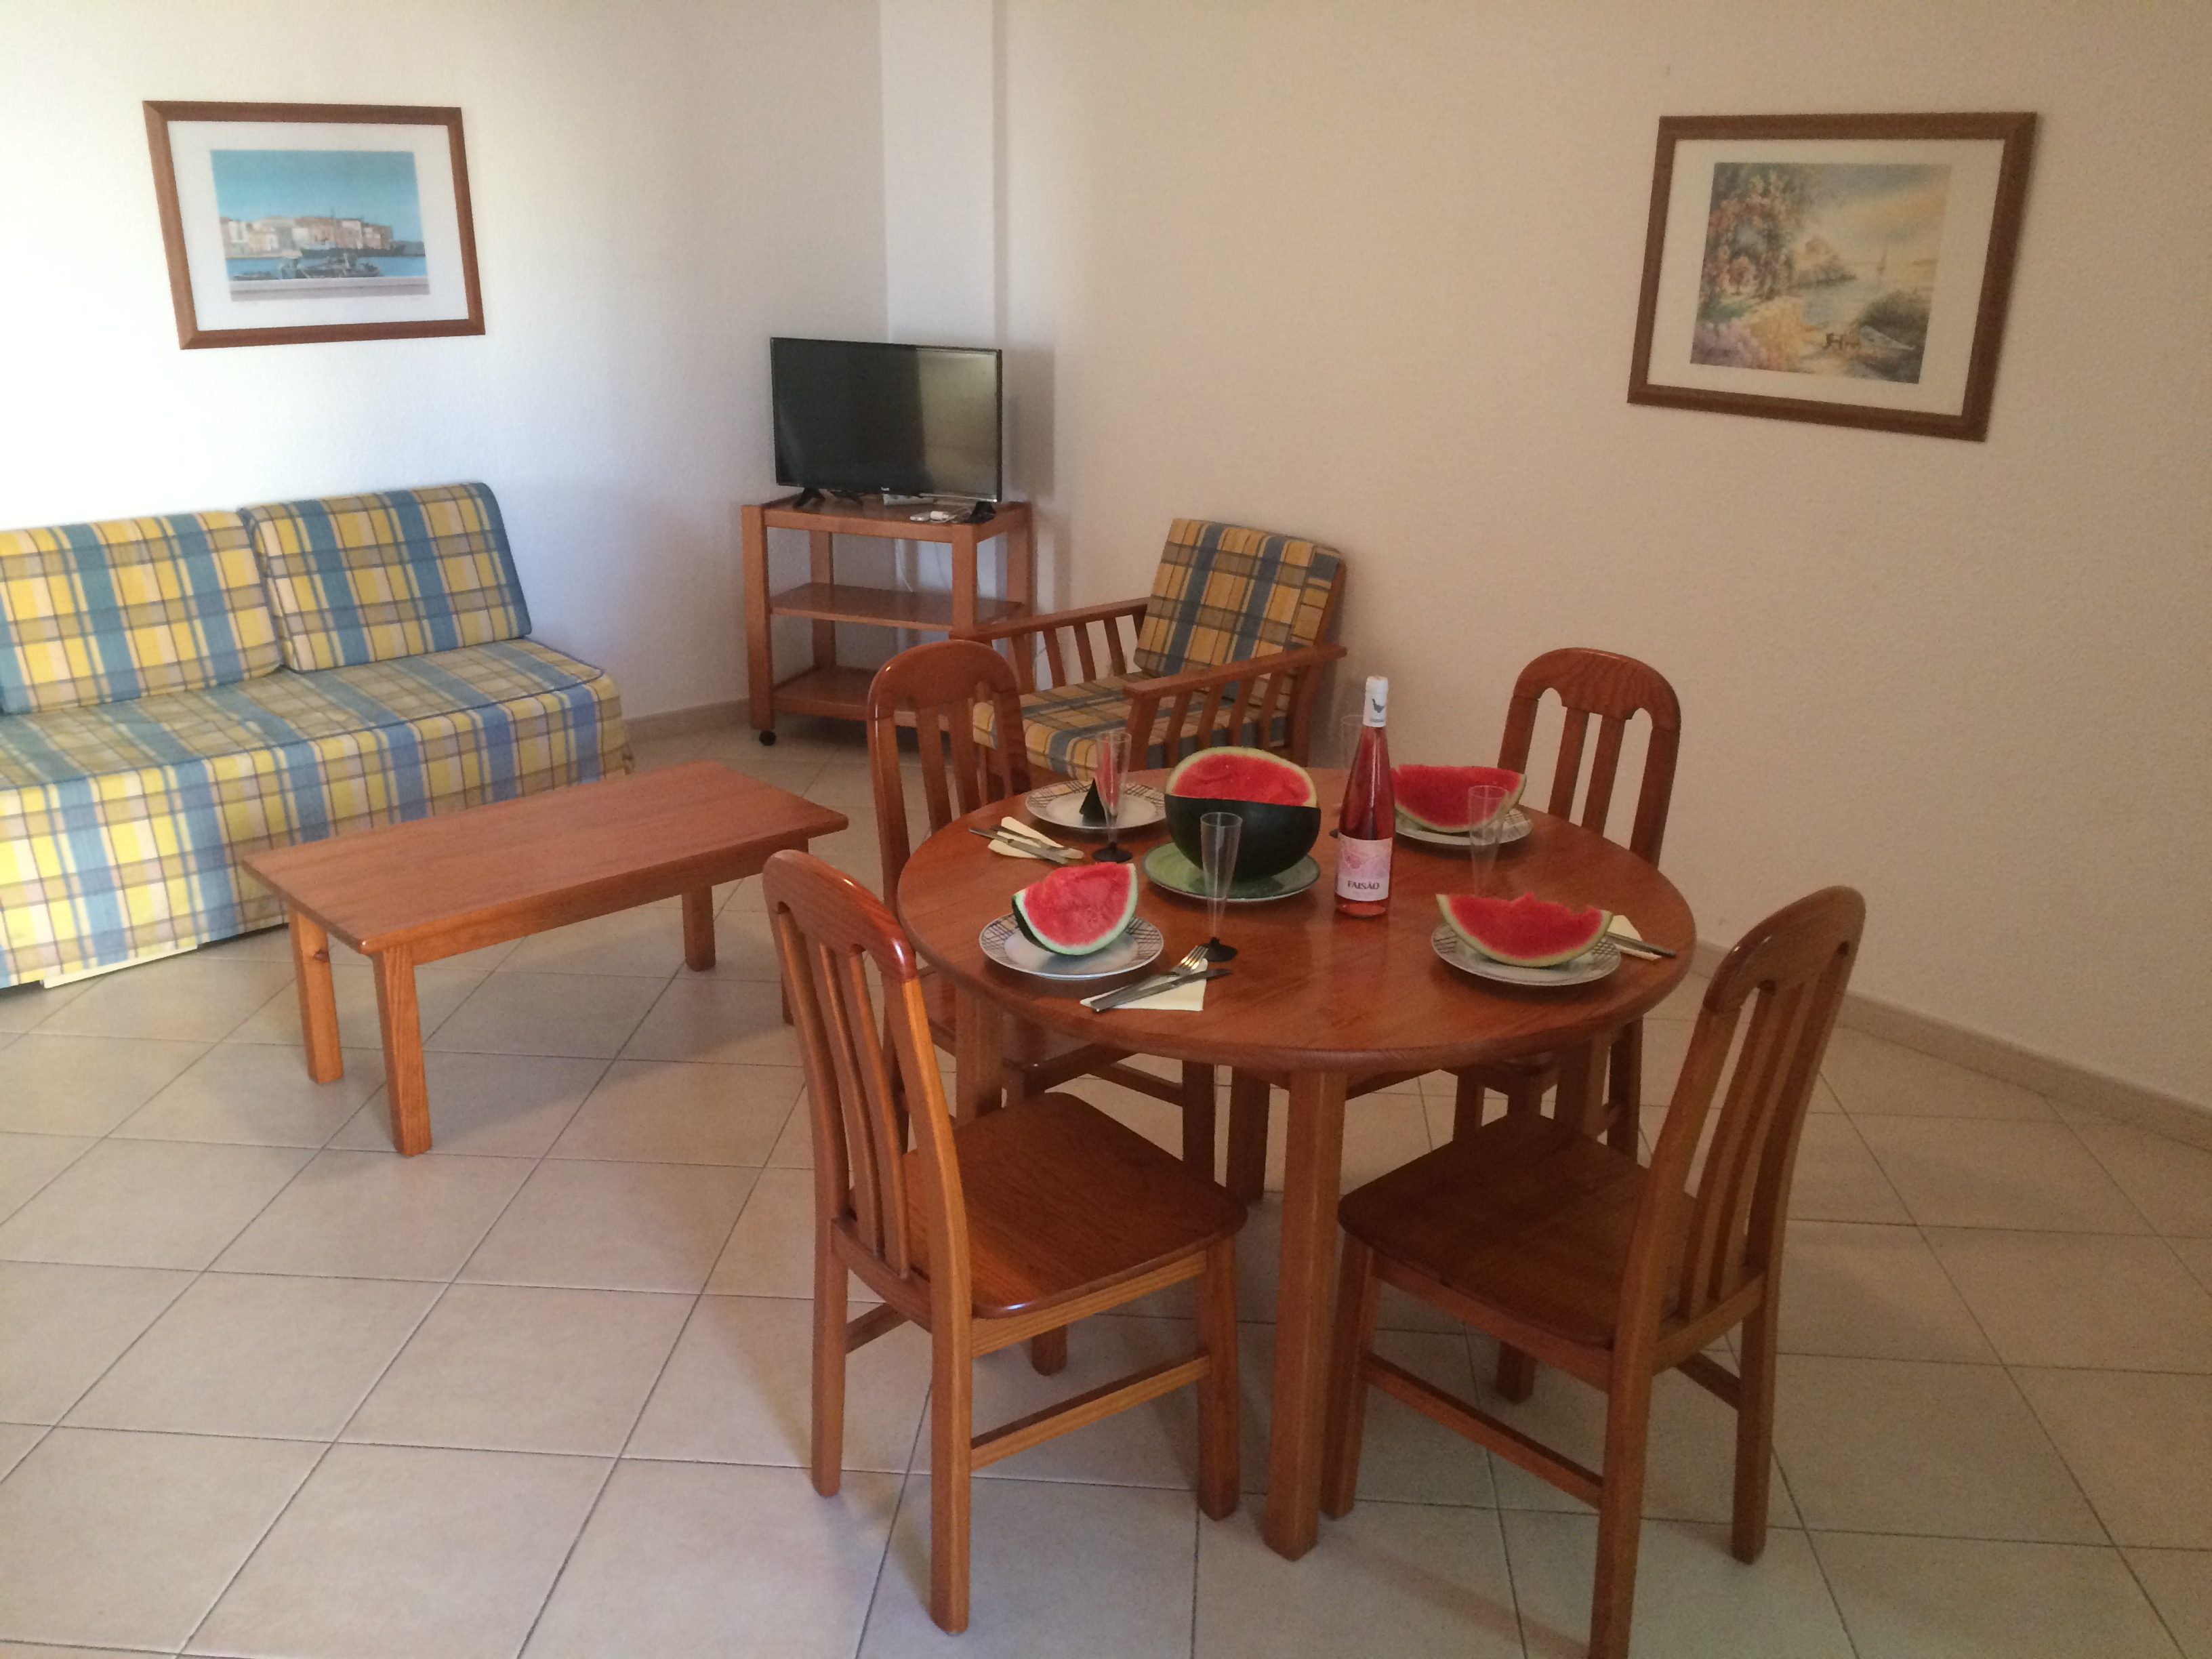 Location appartements et villas de vacance, ROCHA PATIO – T1 BEACH APARTMENT - PORTIMÃO à Portimão, Portugal Algarve, REF_IMG_205_5295